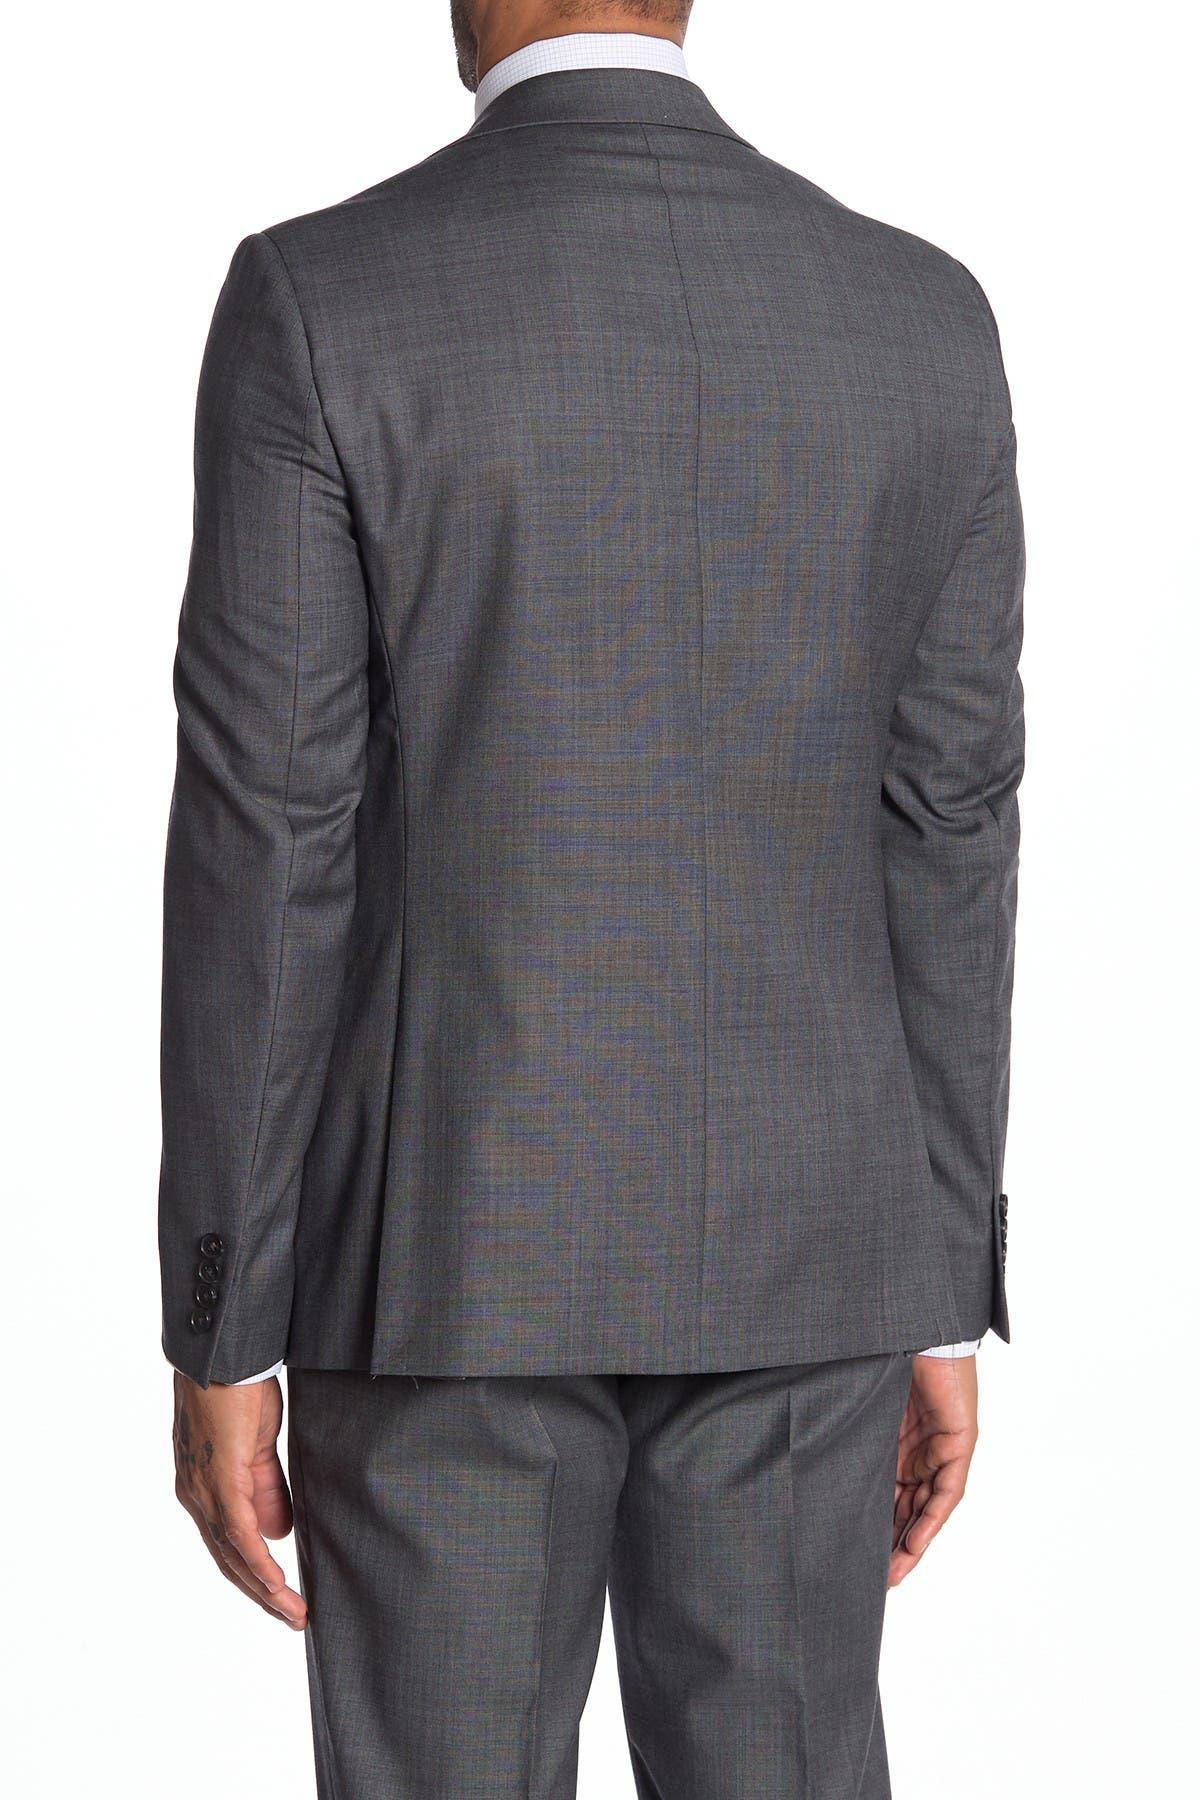 Image of Calvin Klein Malbin Notch Collar Slim Fit Suit Separate Jacket